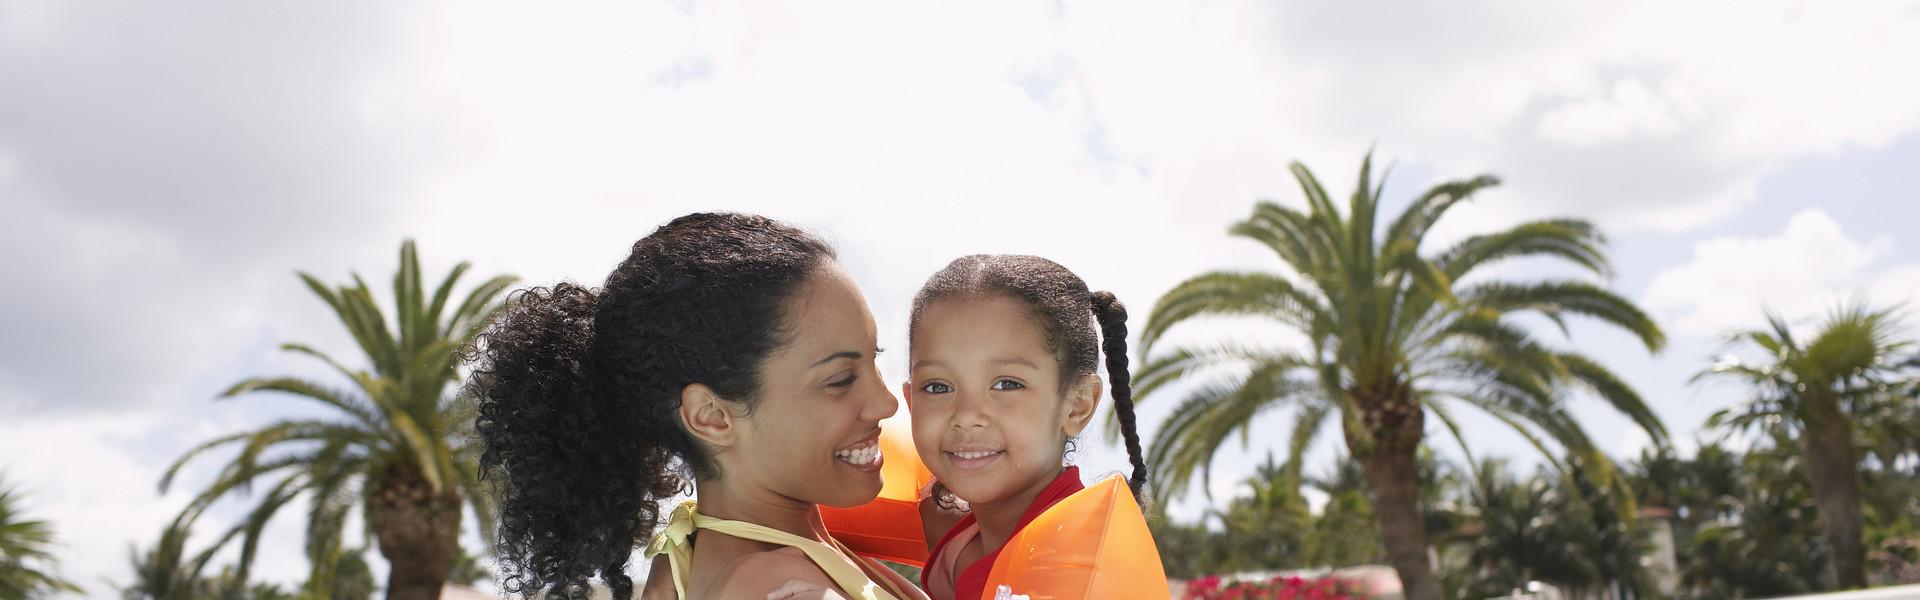 Enjoying Resort Specials & Resort Discounts | Westgate Blue Tree Resort Lake Buena Vista  | Hotel Discounts Near Sea World, Orlando, FL 32836